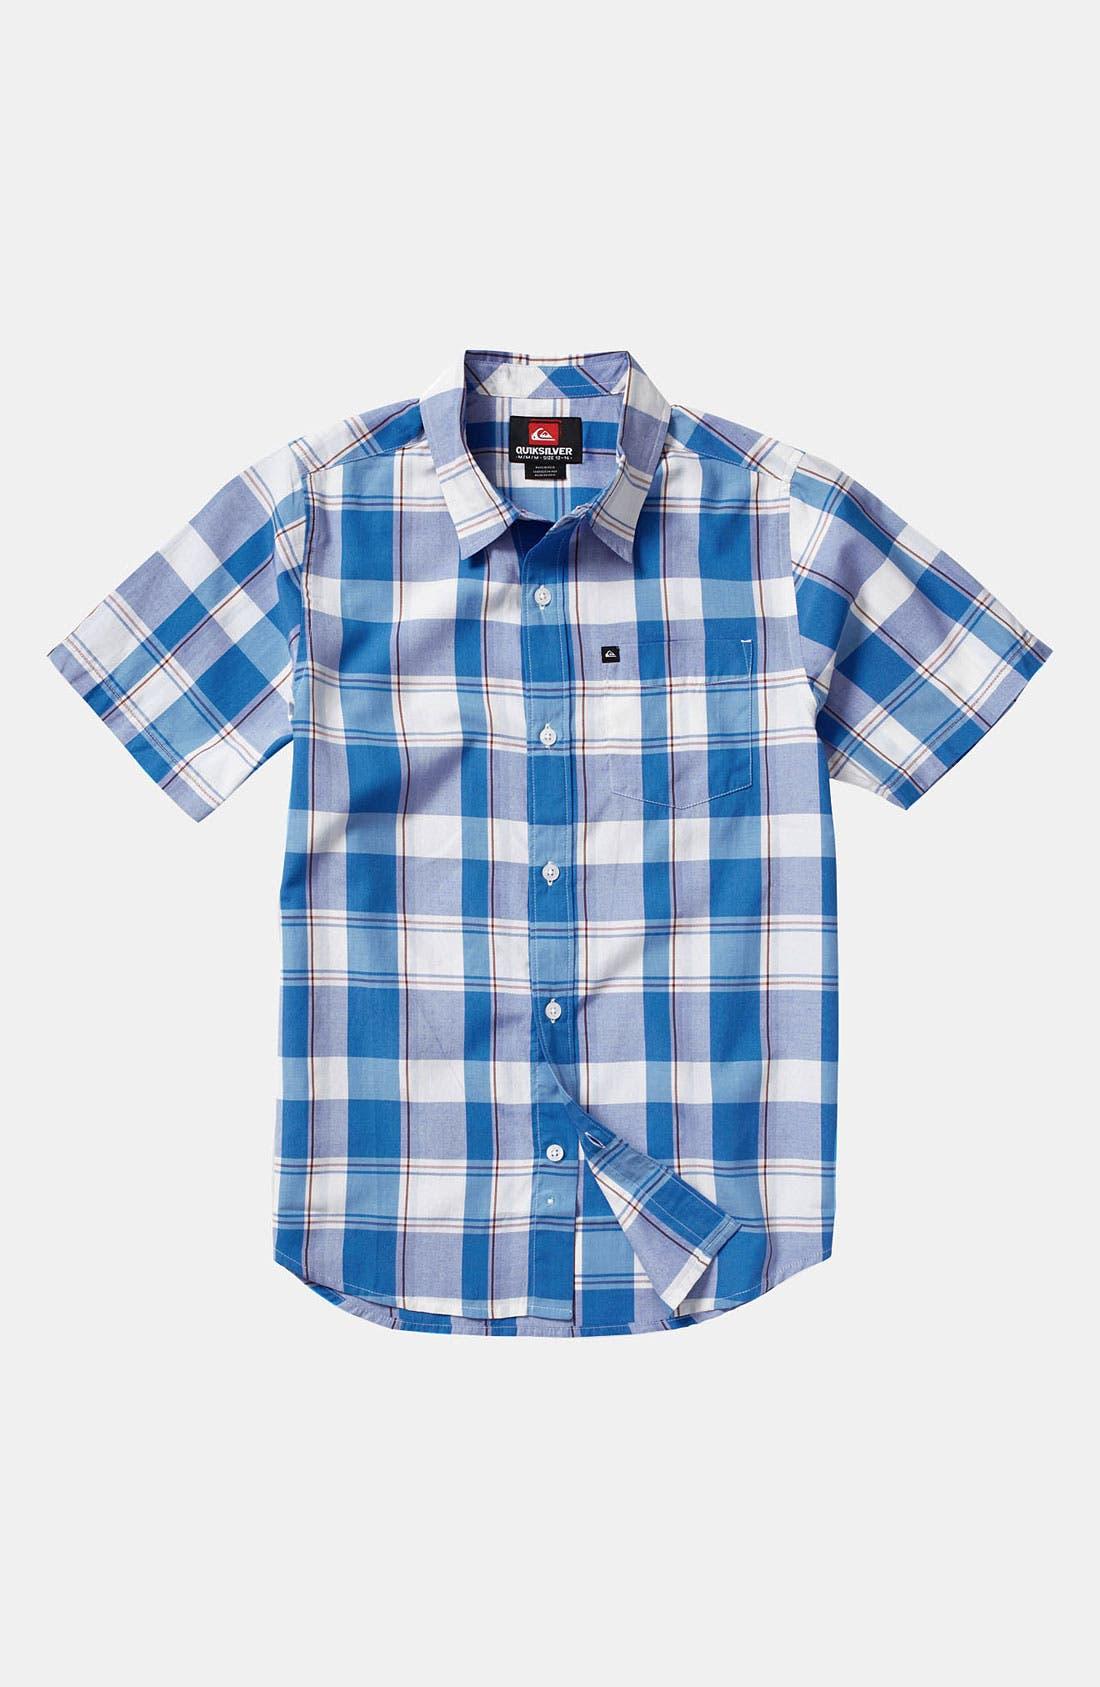 Main Image - Quiksilver 'El Pat' Woven Shirt (Toddler)